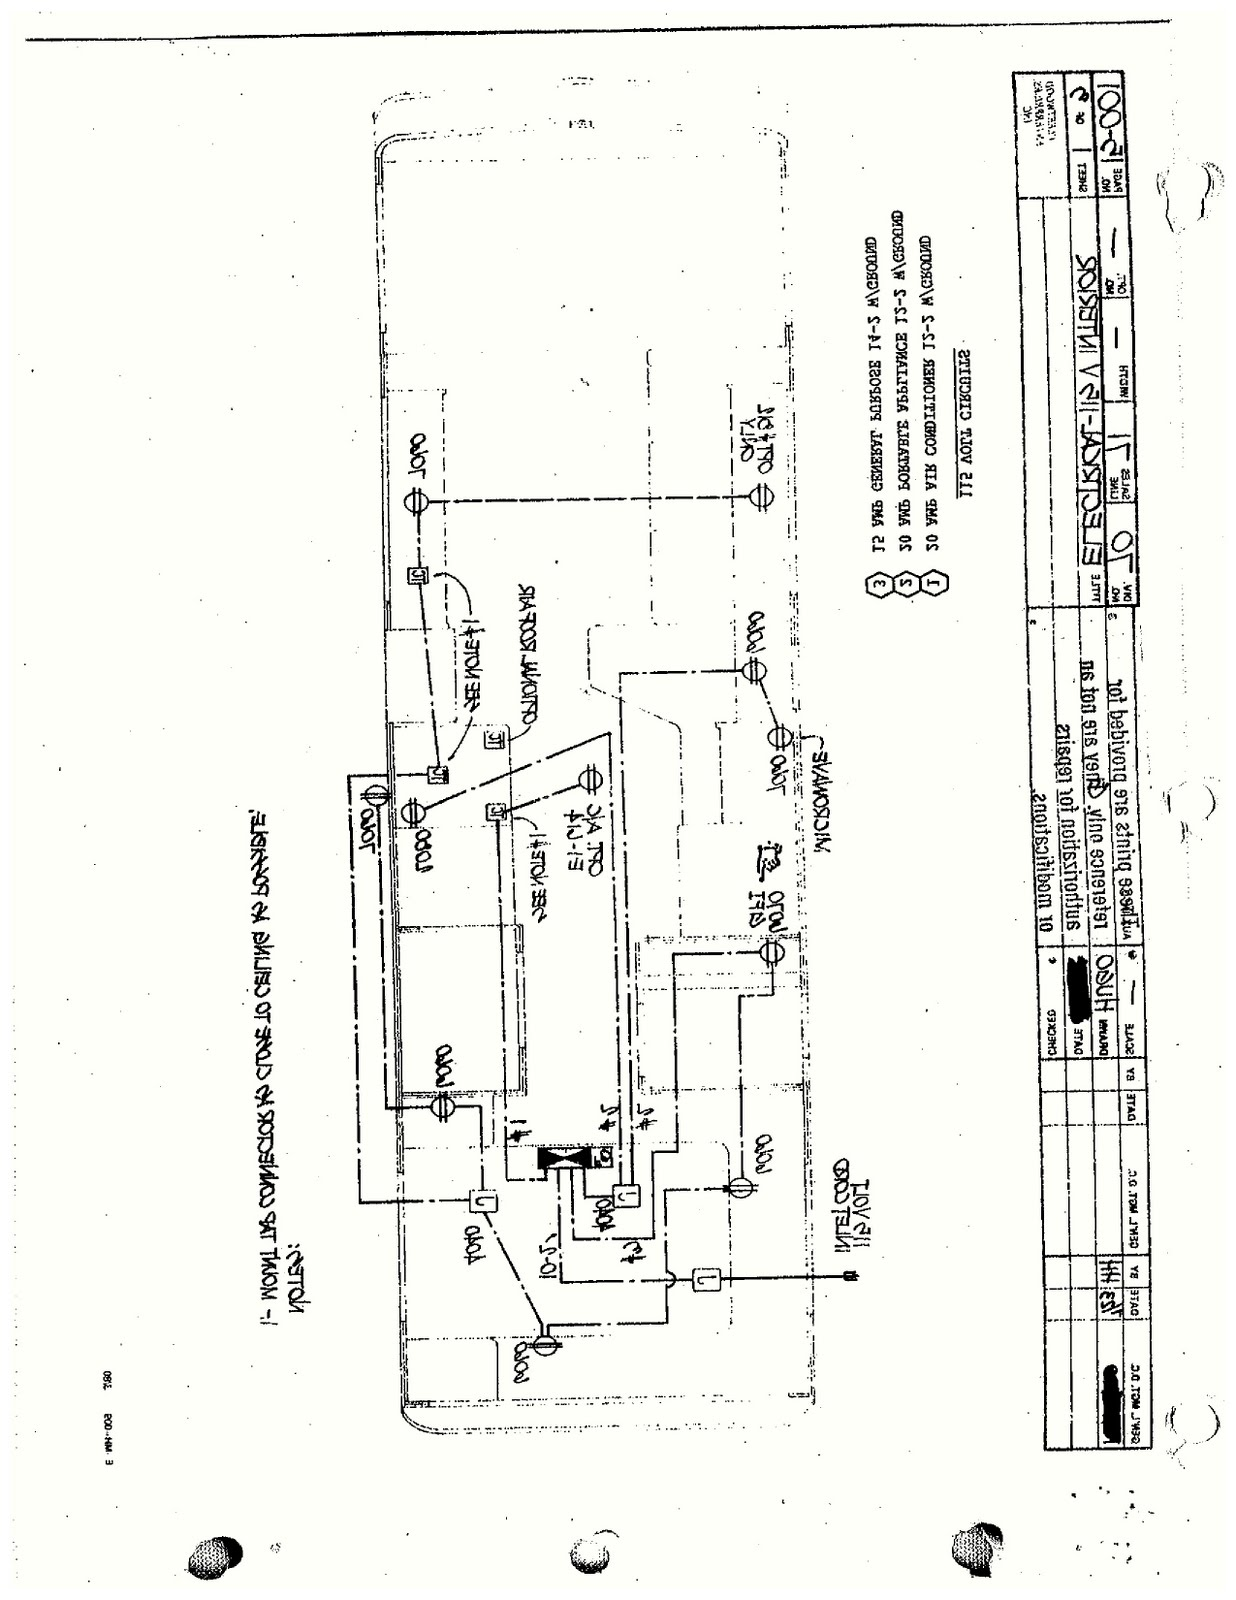 1987 coleman pop up camper wiring diagram somurich com fleetwood travel trailer wiring fleetwood  [ 1236 x 1600 Pixel ]